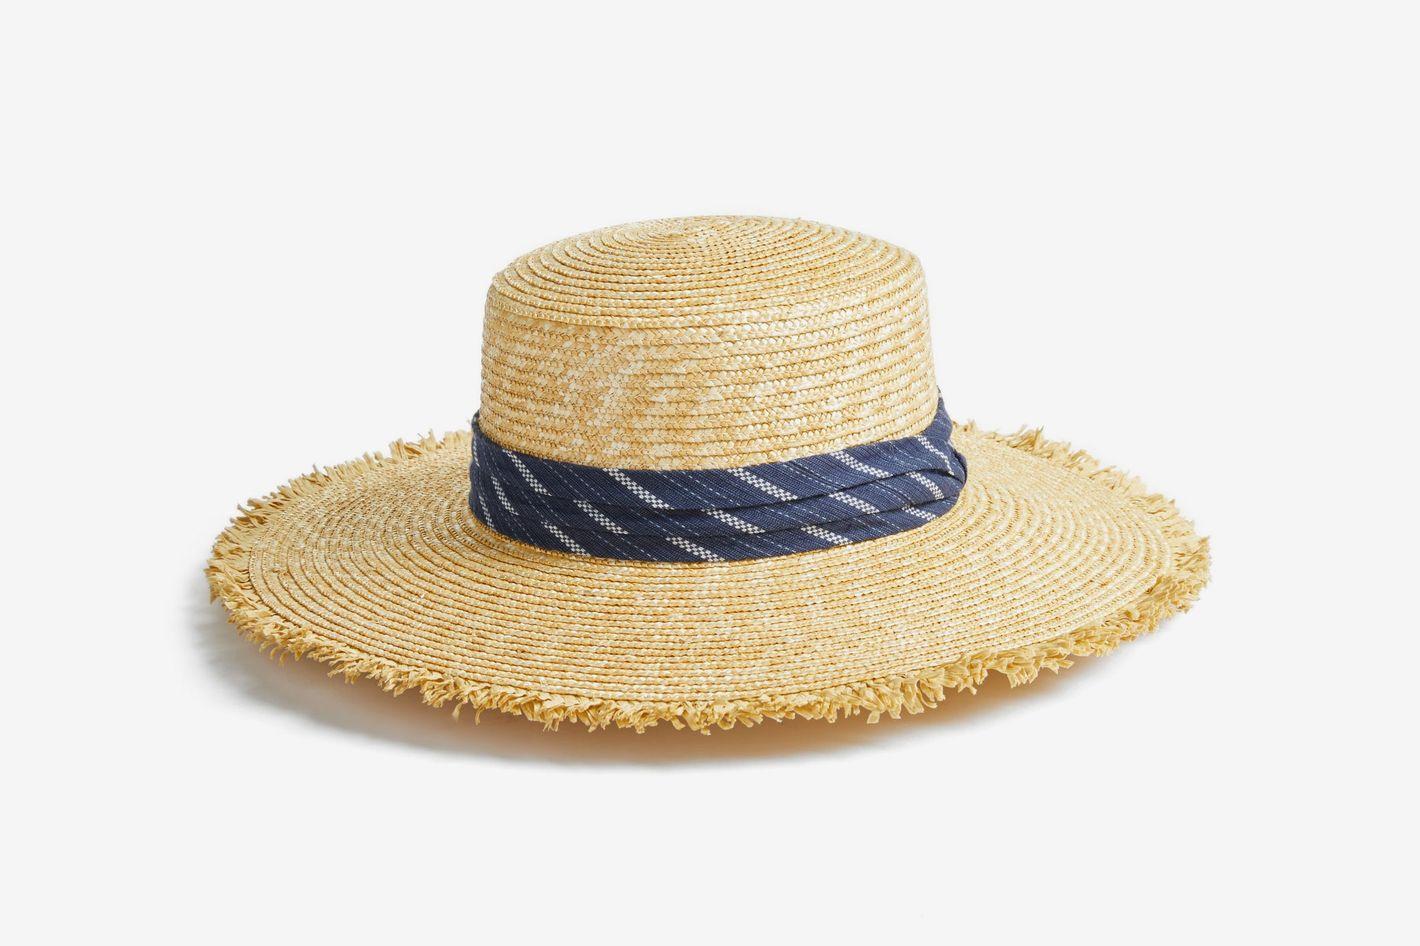 BCBG Max Azria Denim Banded Straw Boater Hat 6bf0a3b9560